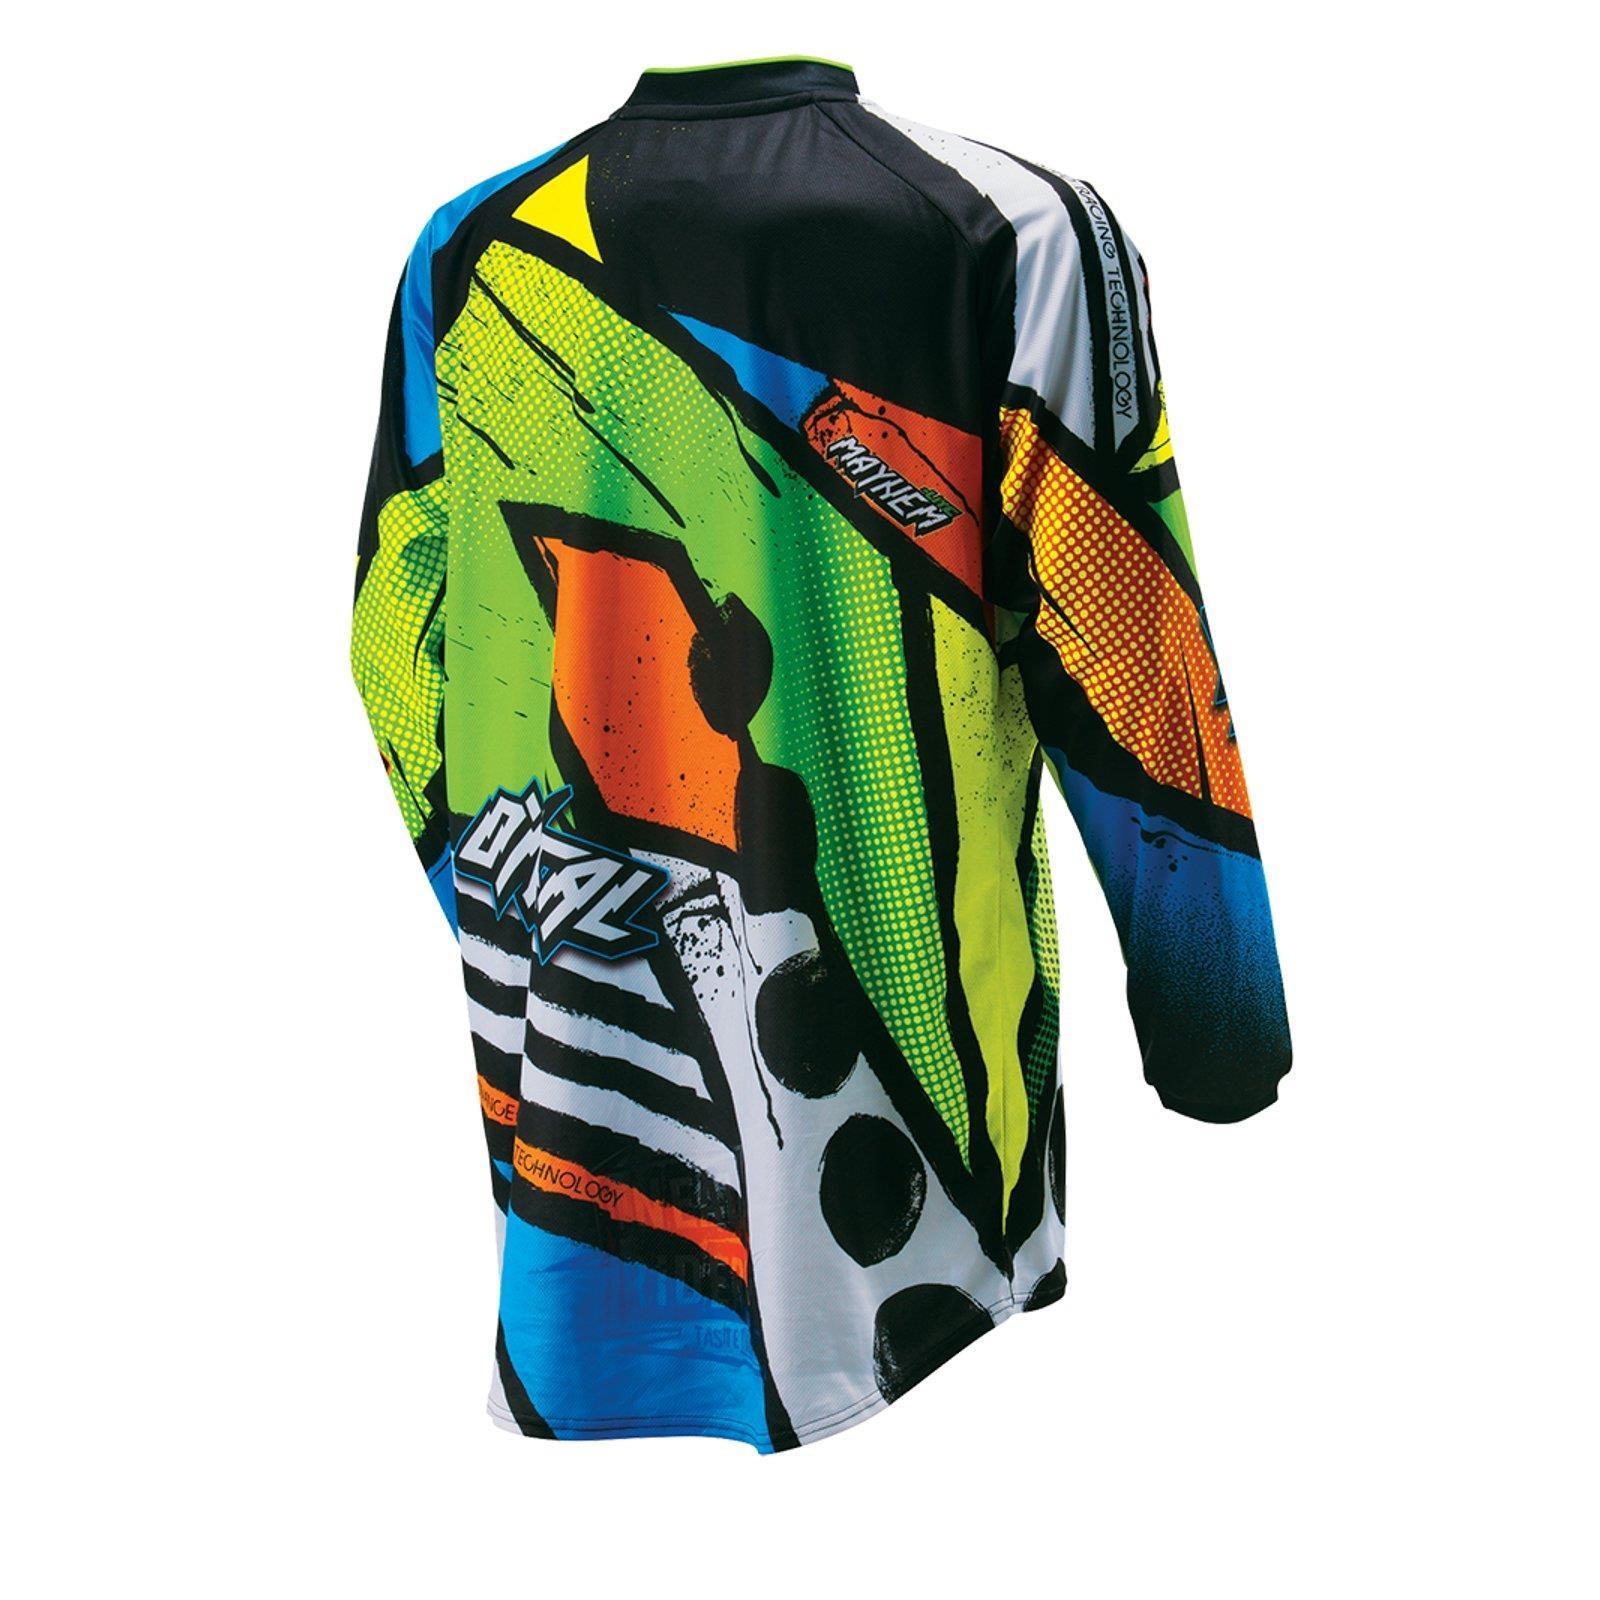 O-039-Neal-elemento-Mayhem-JERSEY-Racewear-Motocross-Maglia-MX-DH-FR-MTB-MOUNTAIN-BIKE miniatura 92